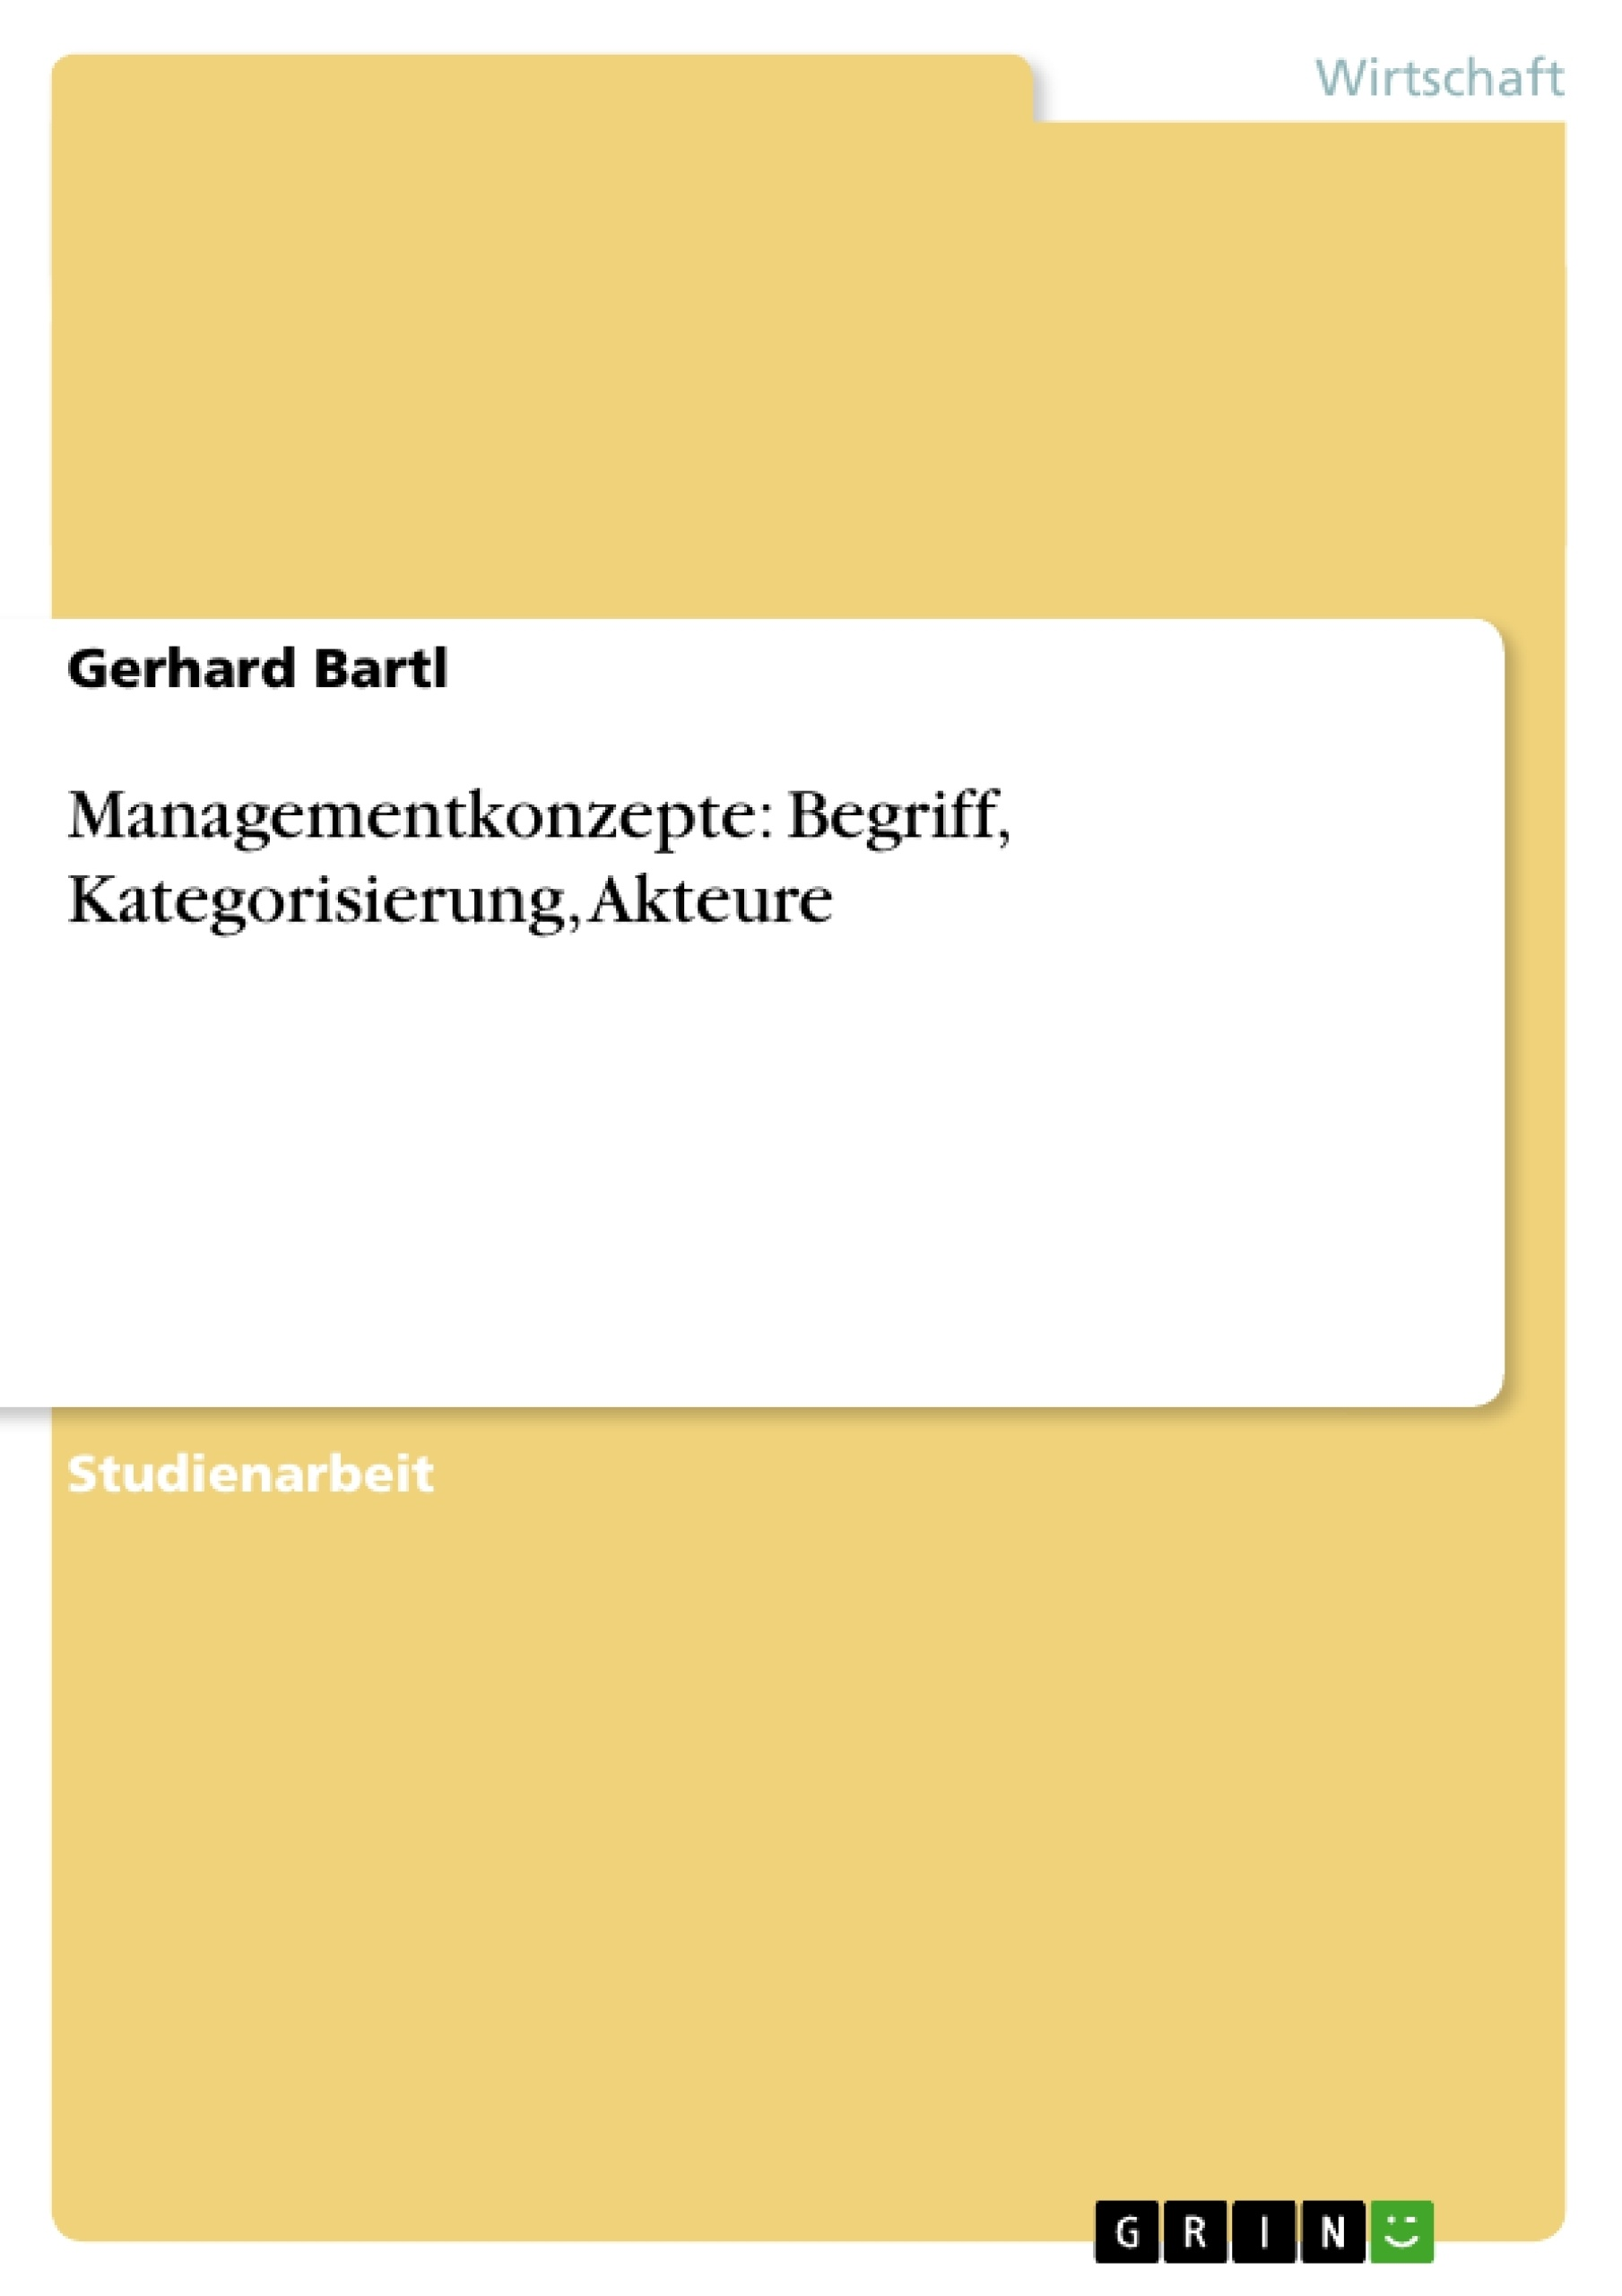 Titel: Managementkonzepte: Begriff, Kategorisierung, Akteure